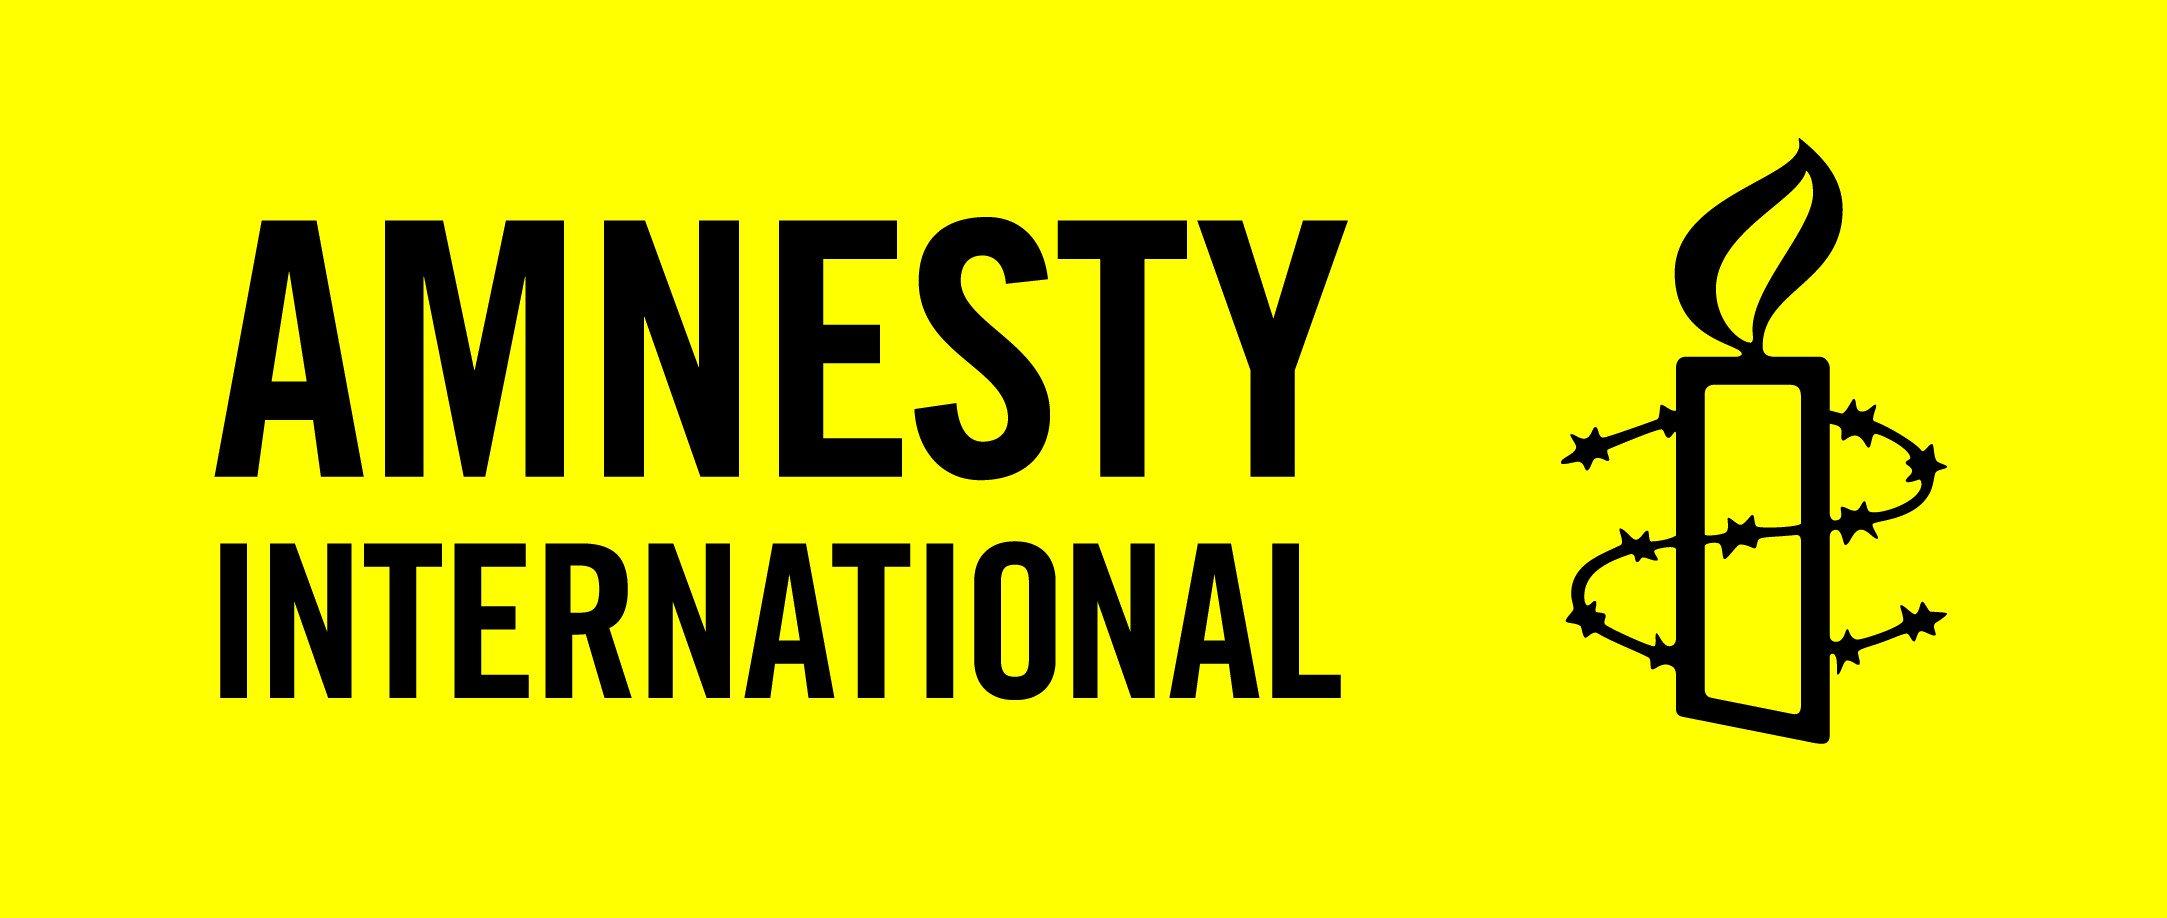 Amnesty International Canada: Online Learning Centre